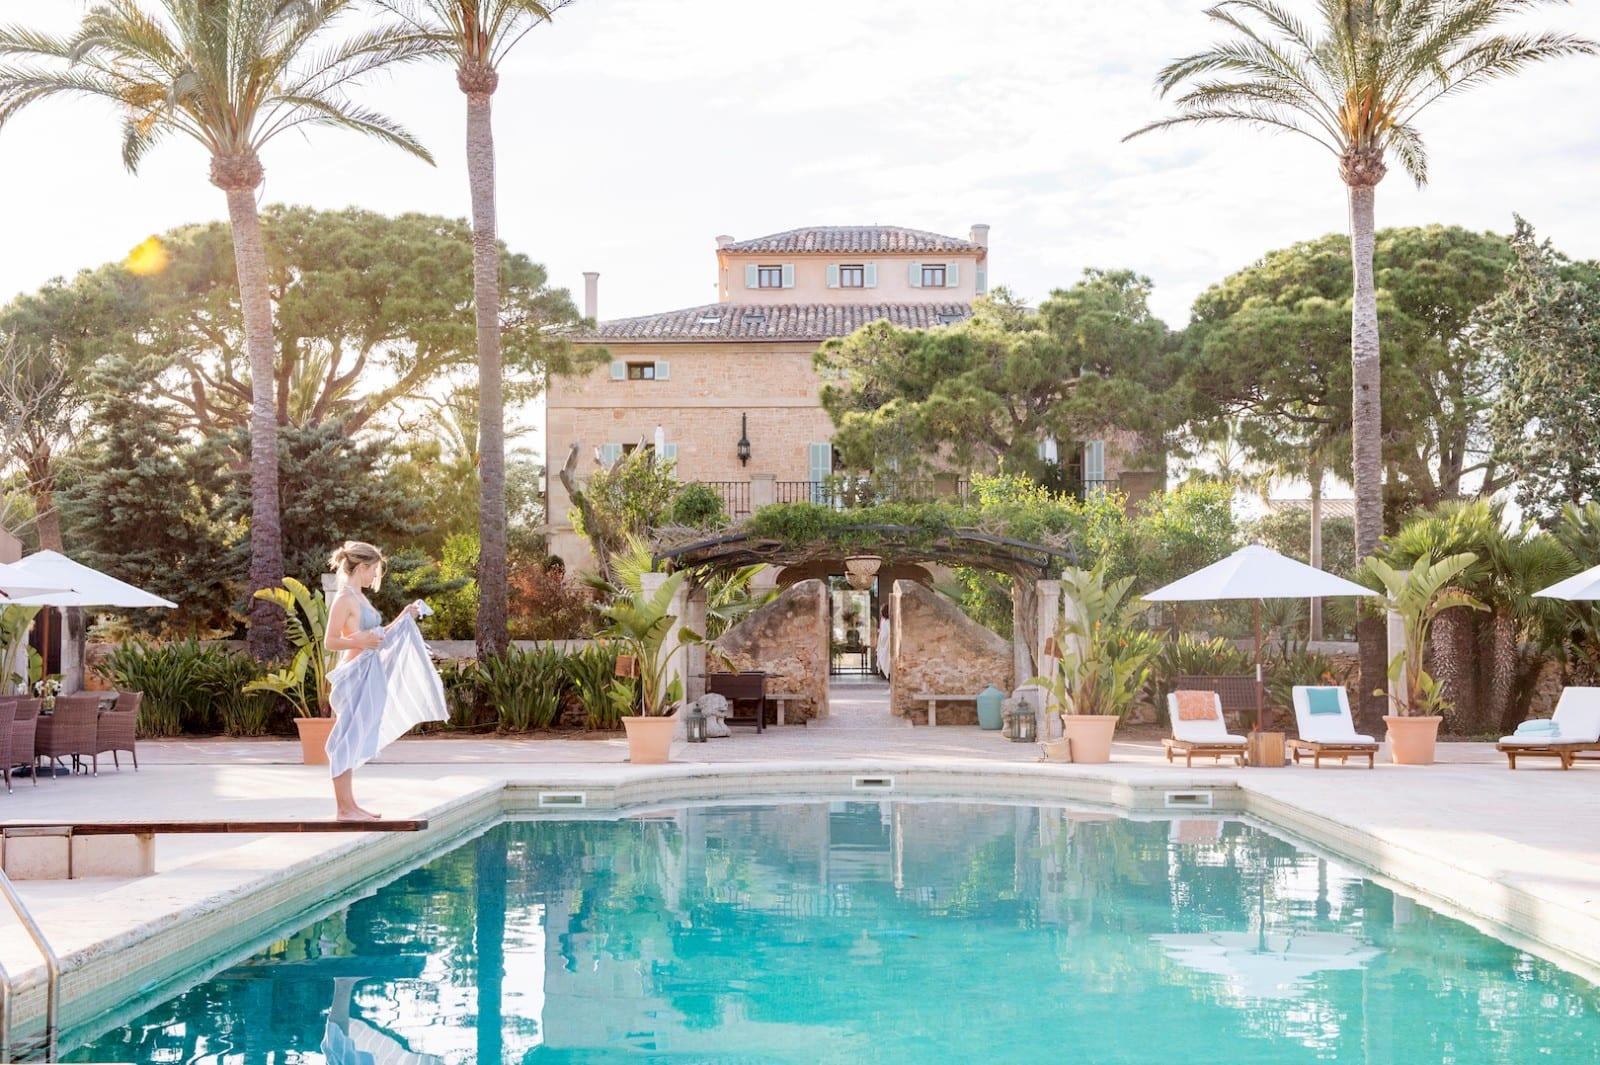 Holistic Retreat Cal Reiet Pool by Pär Olsson